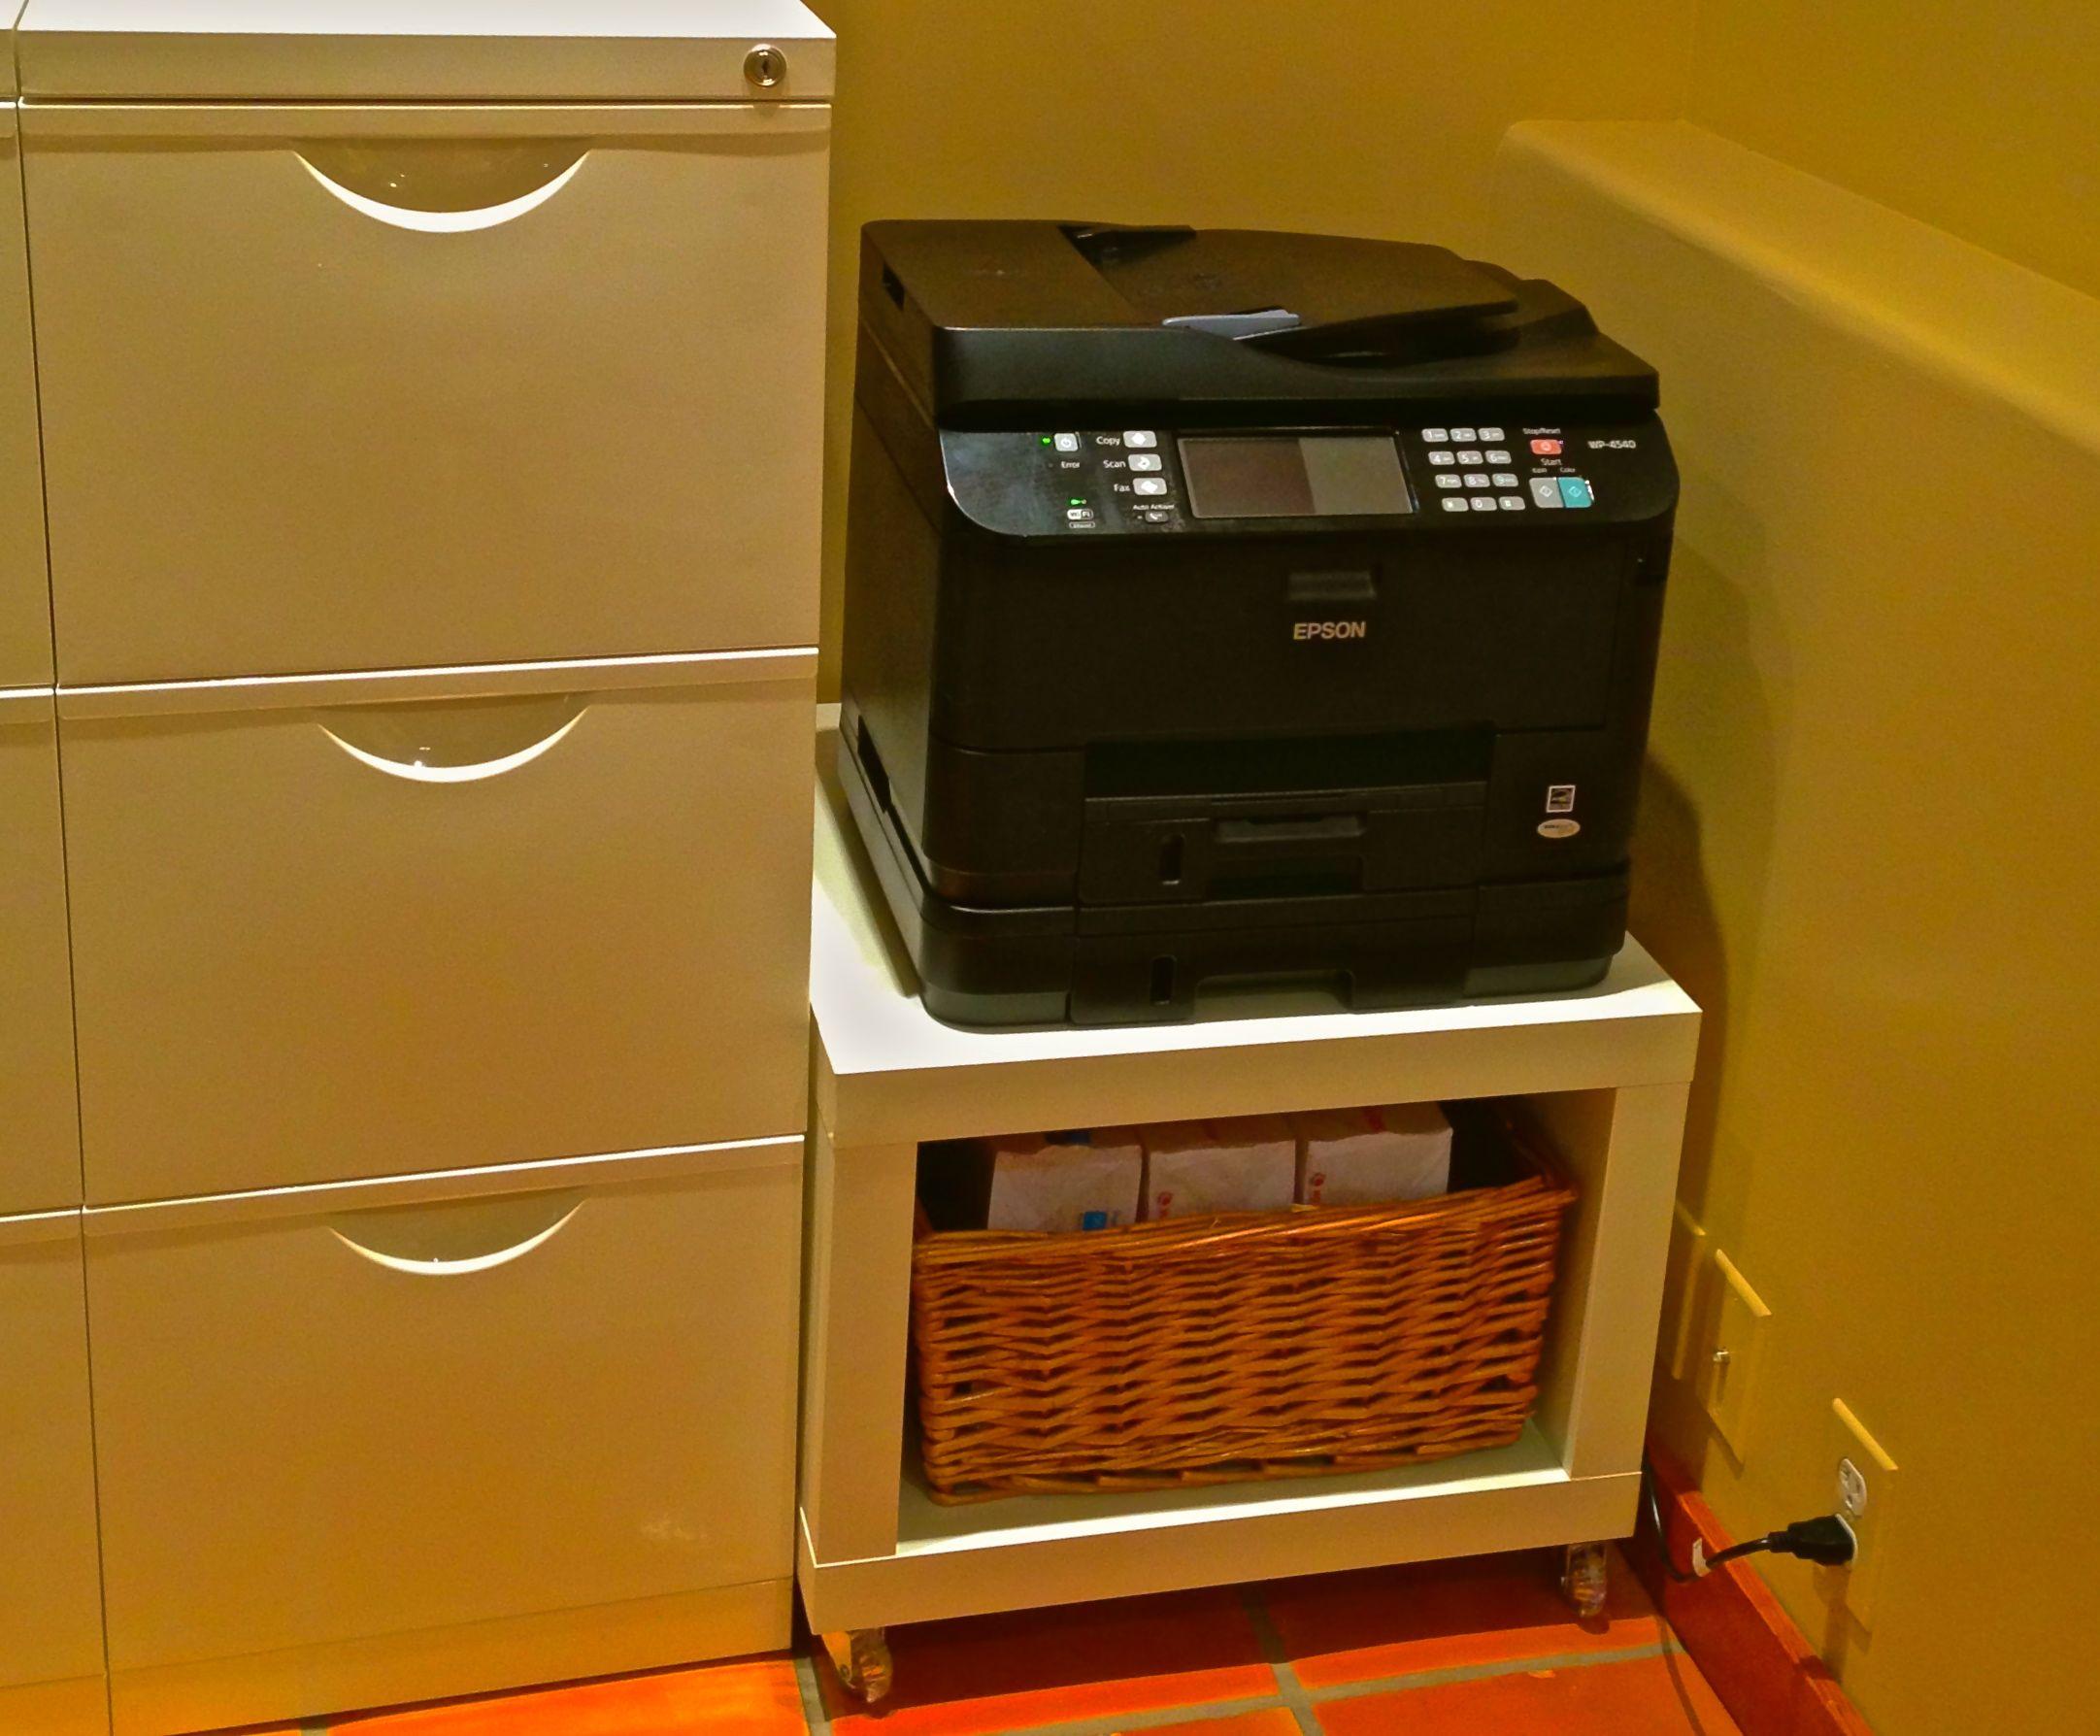 Ikea Us Furniture And Home Furnishings Industrial Home Design Ikea Living Room Printer Storage